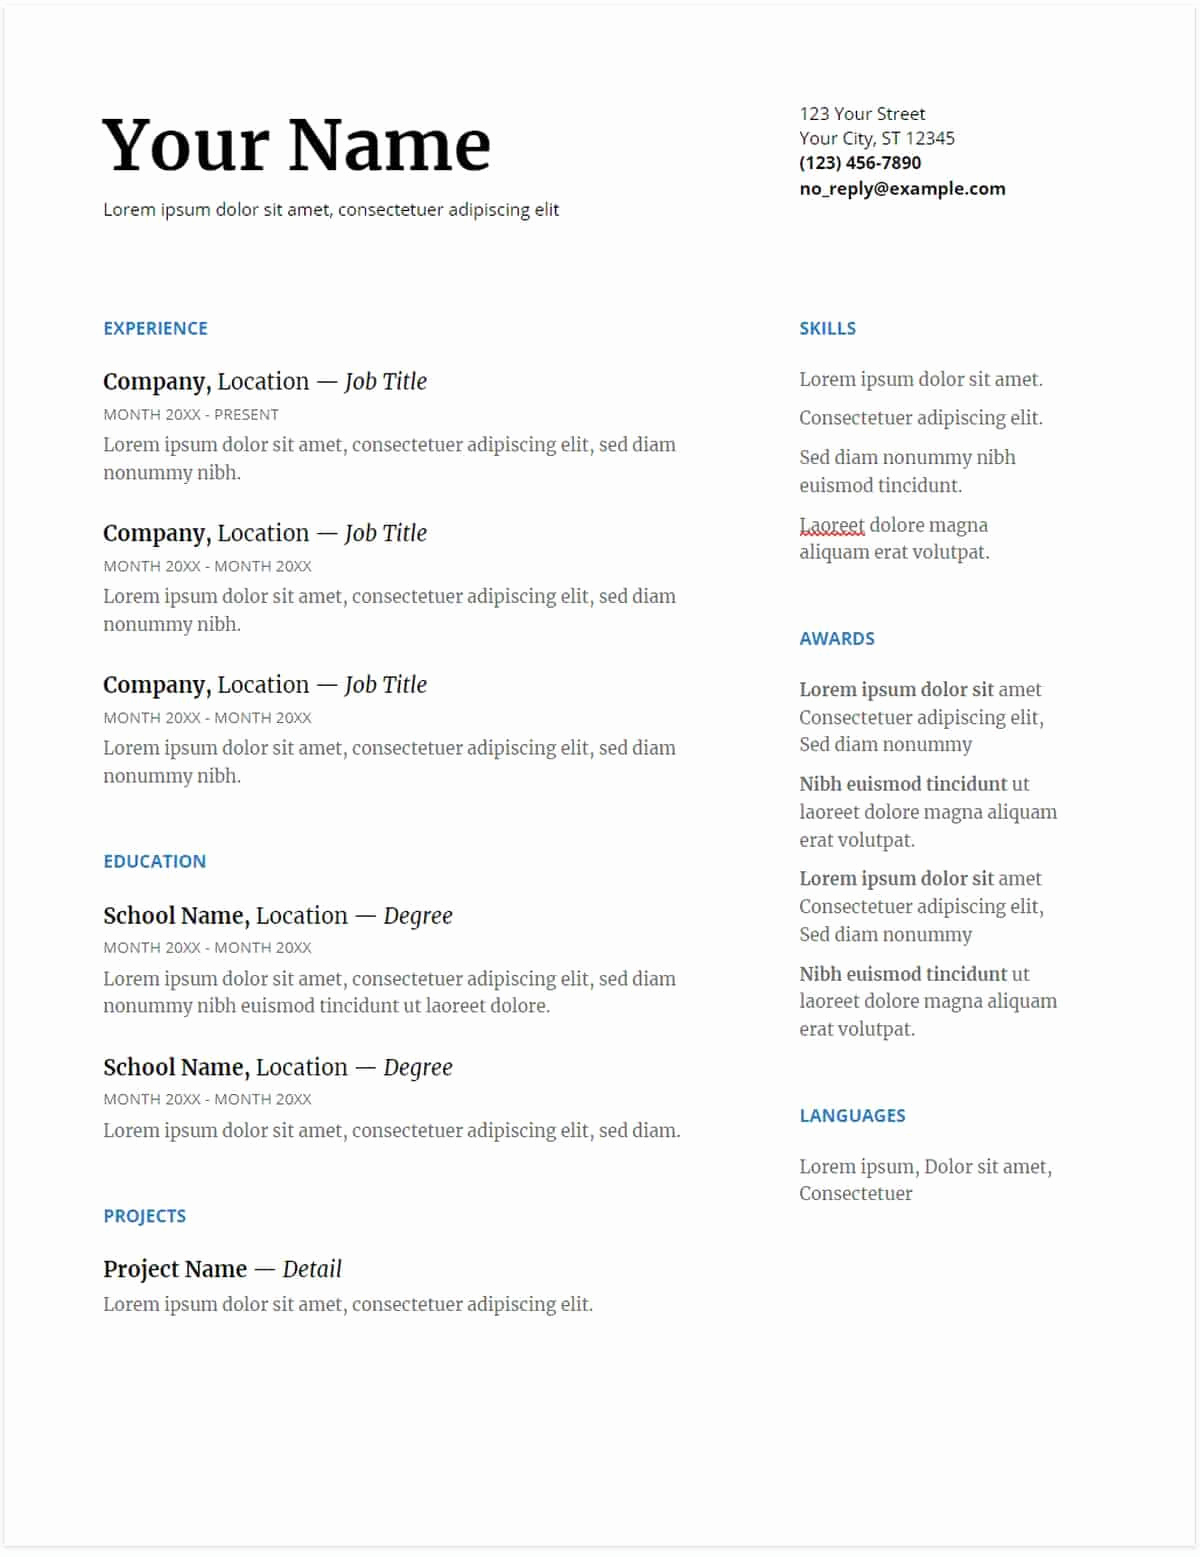 Free Printable Resume Templates New 30 Google Docs Resume Templates [downloadable Pdfs]